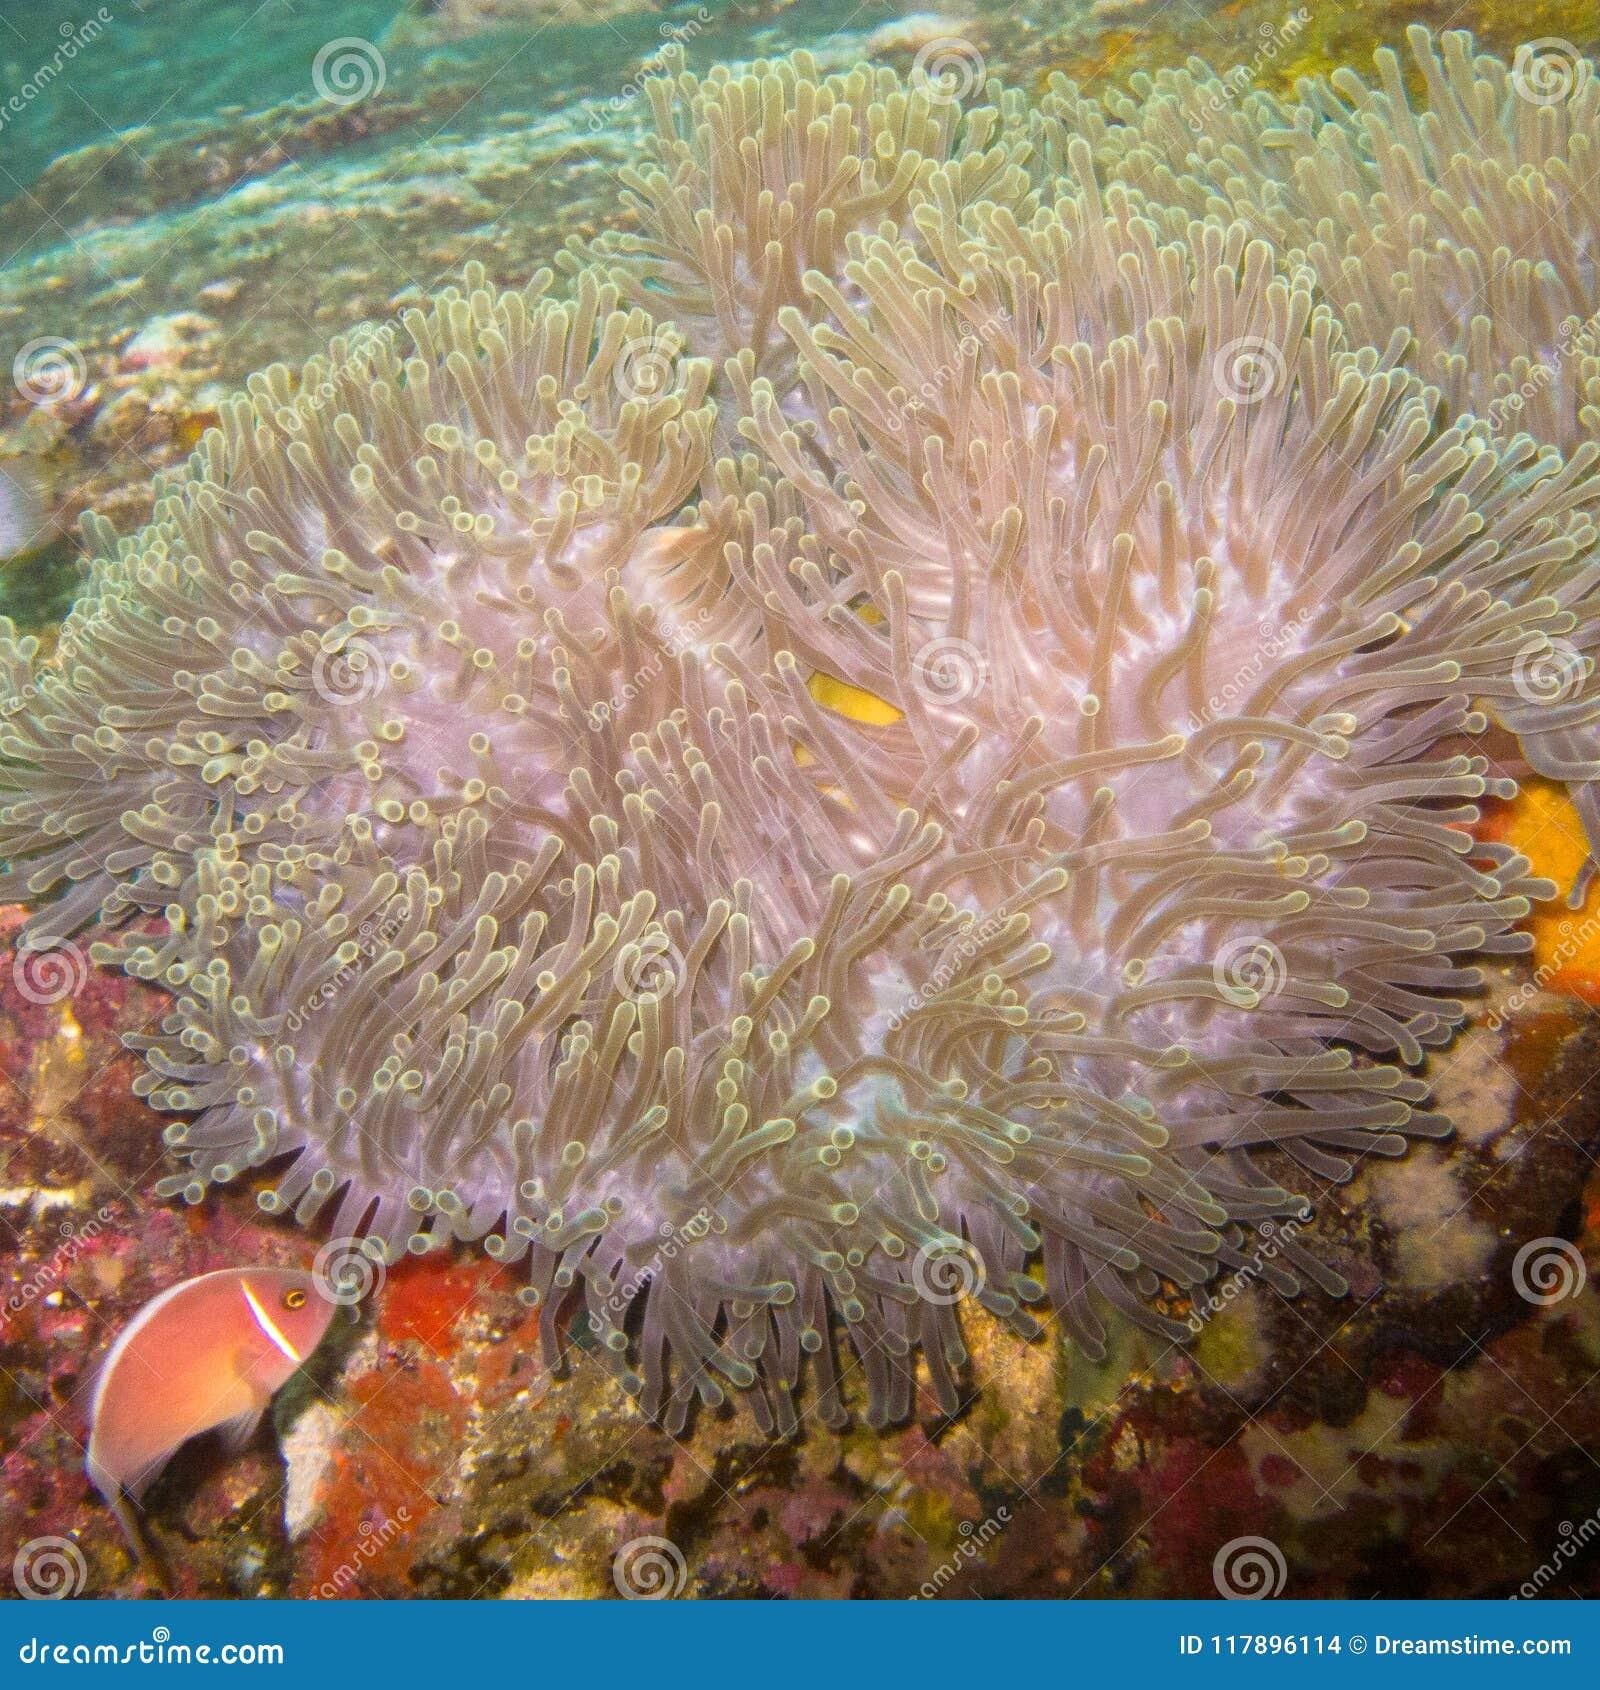 Anemone underwater, an animal looking like a flower